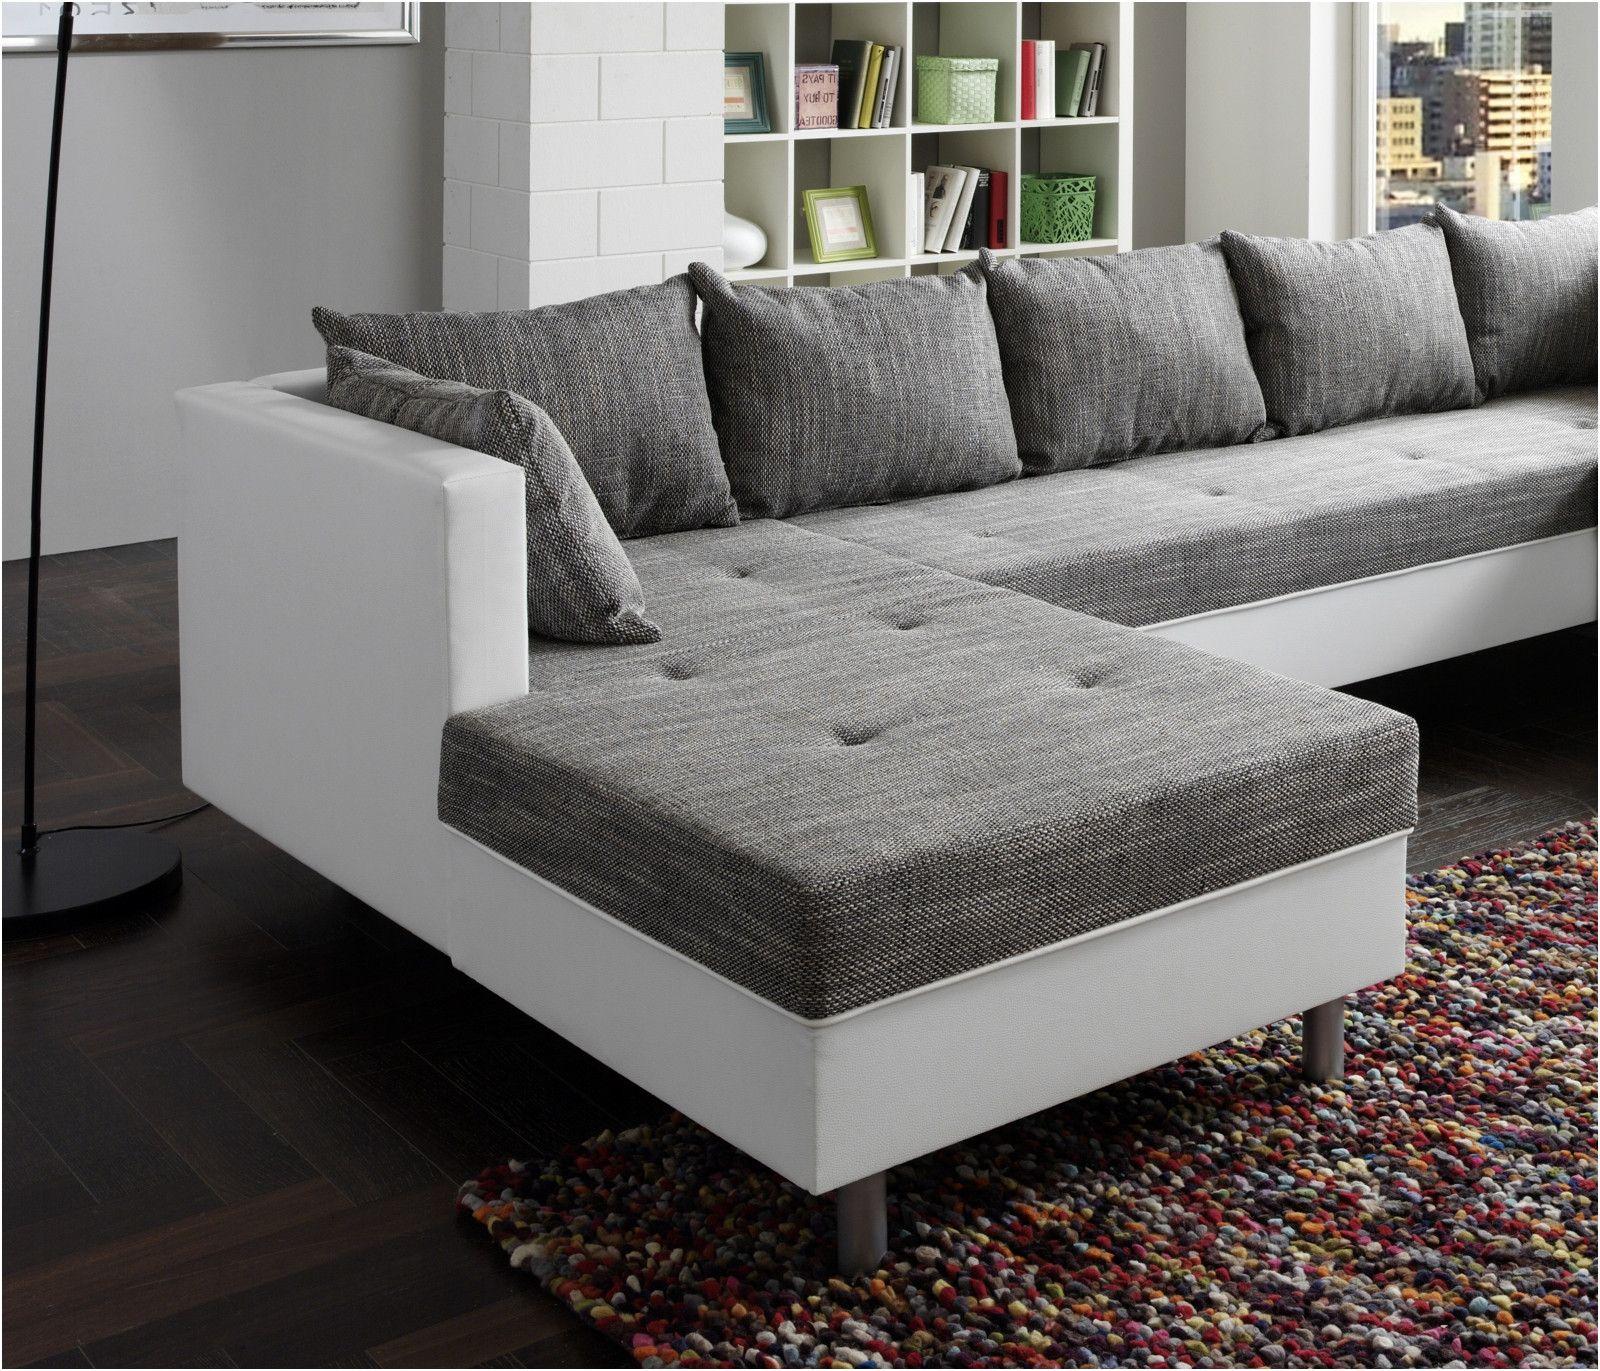 Fabulous Big Sofa Mobel Boss Big Sofas Home Decor Home